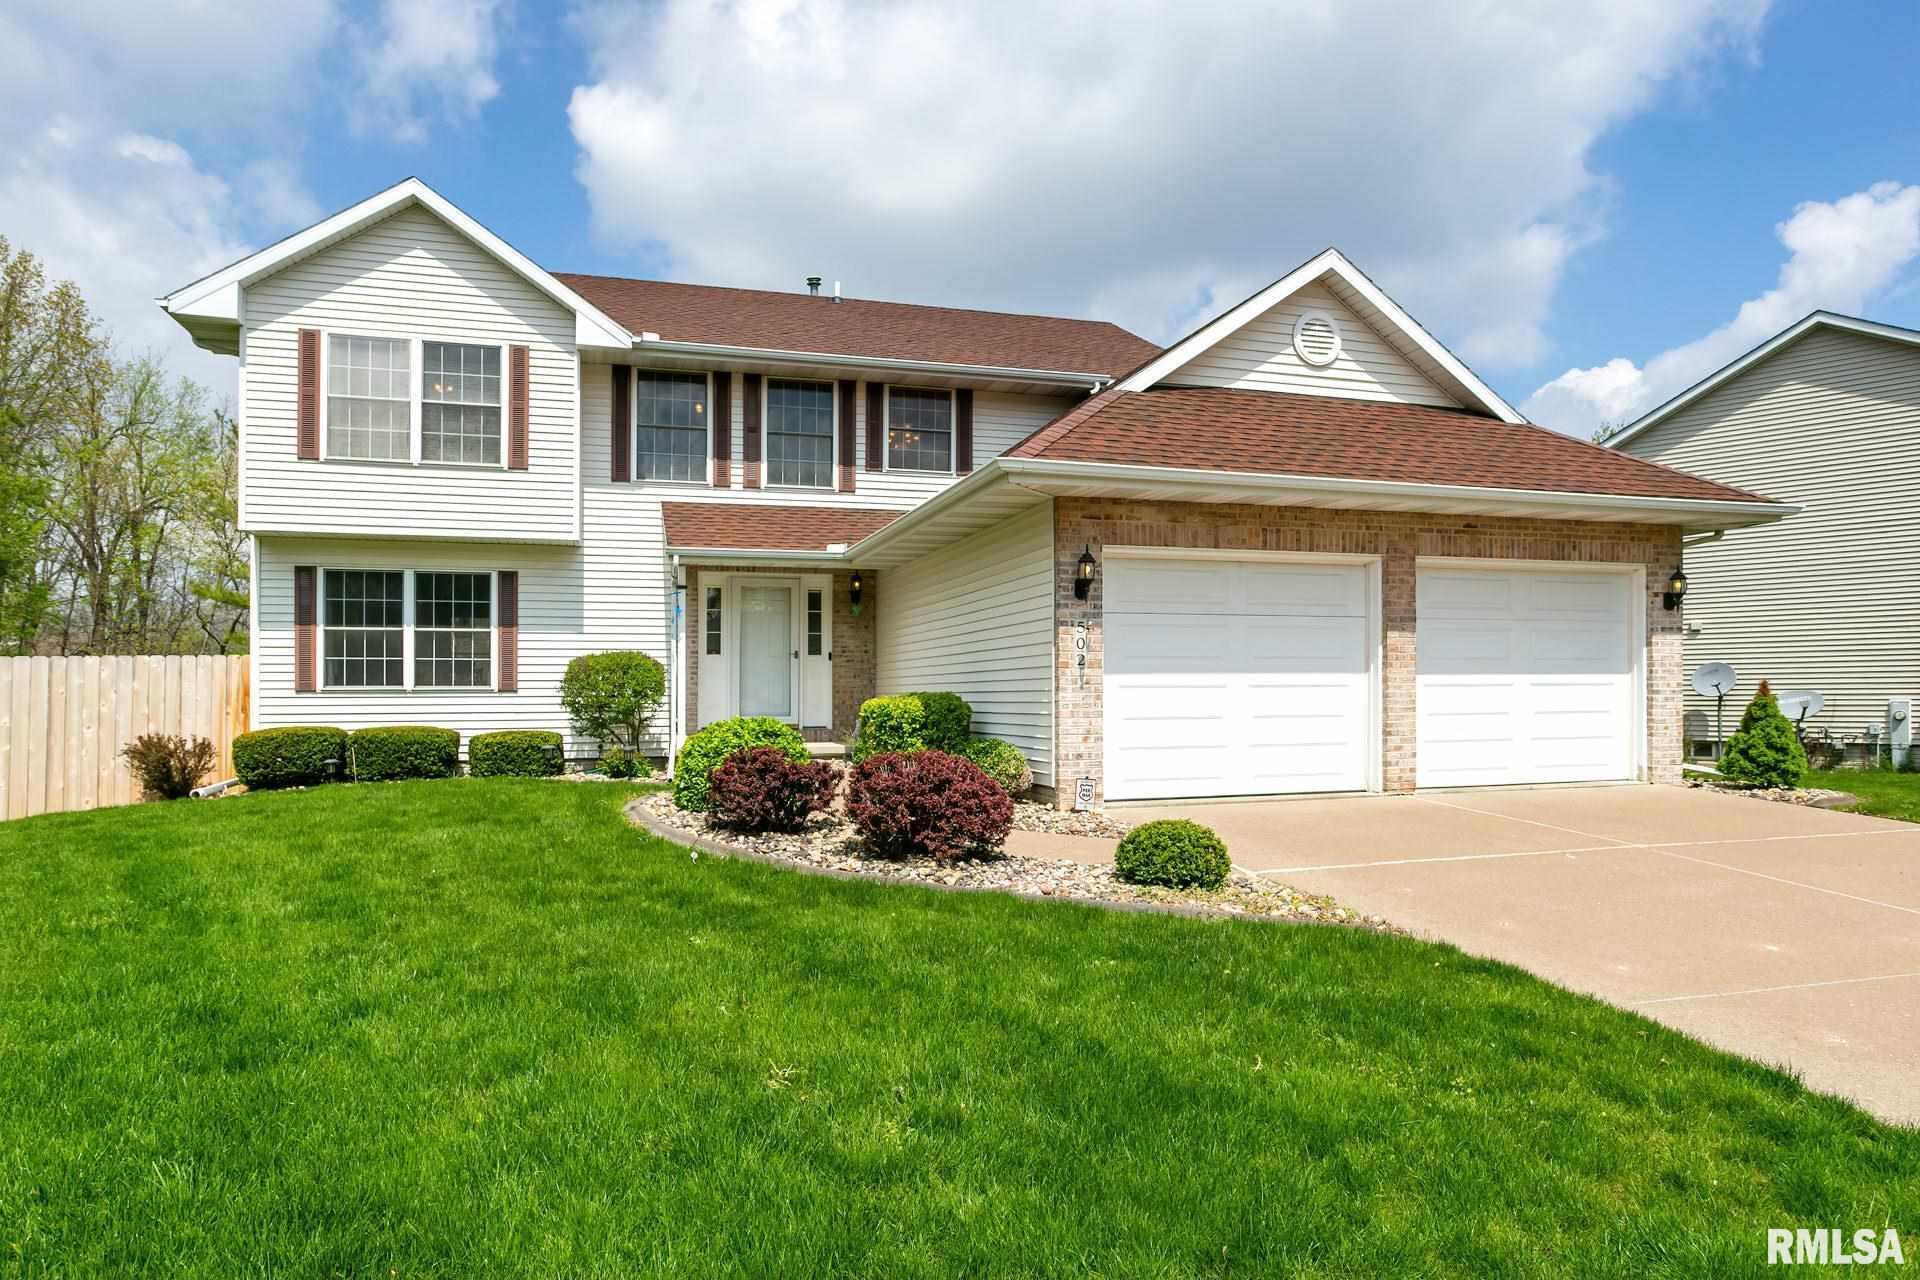 502 E 14TH Property Photo - Coal Valley, IL real estate listing